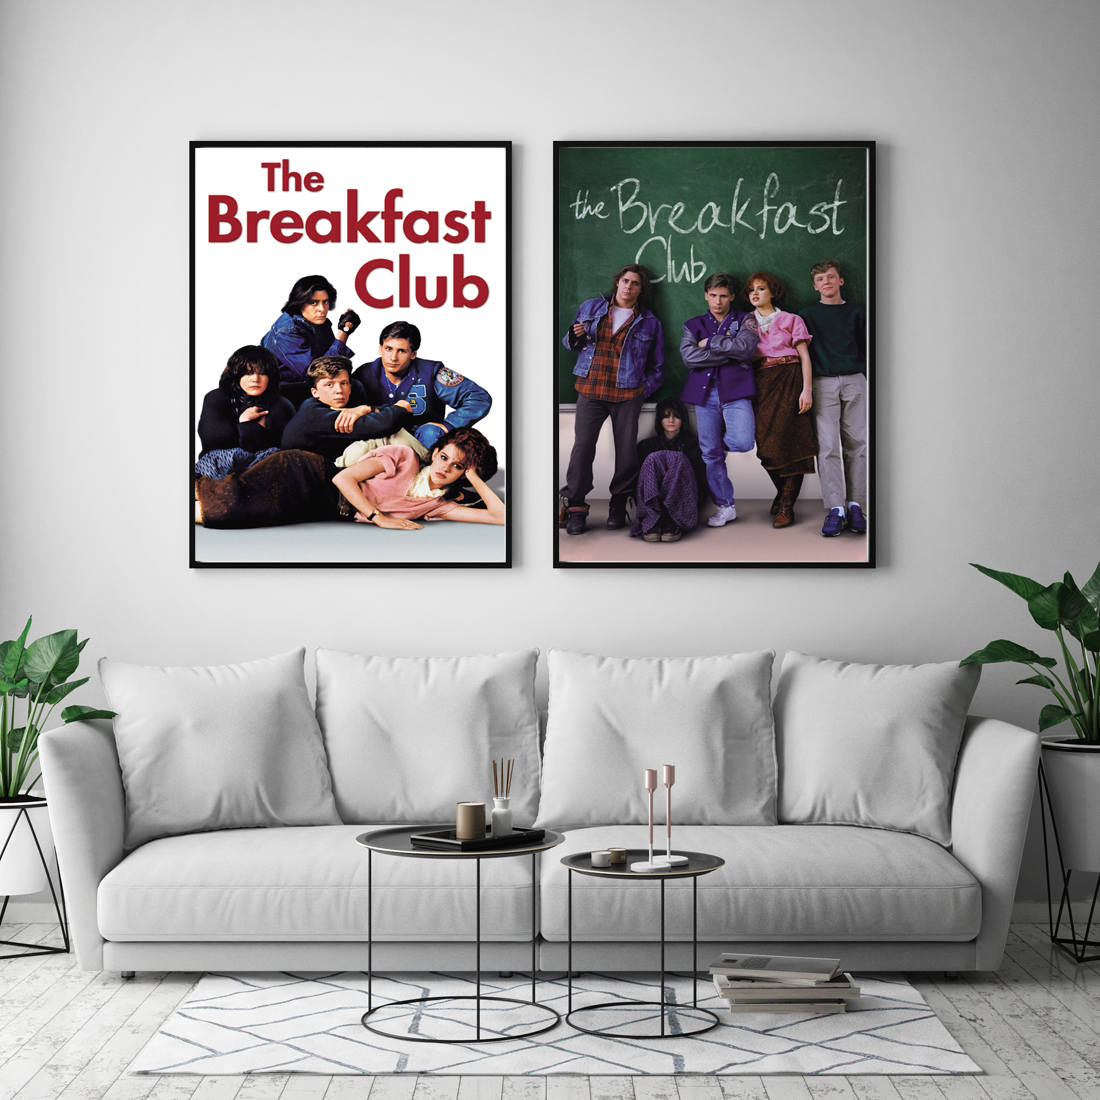 THE BREAKFAST CLUB Movie Art Silk Canvas Poster Print 12x18 24x36 inch